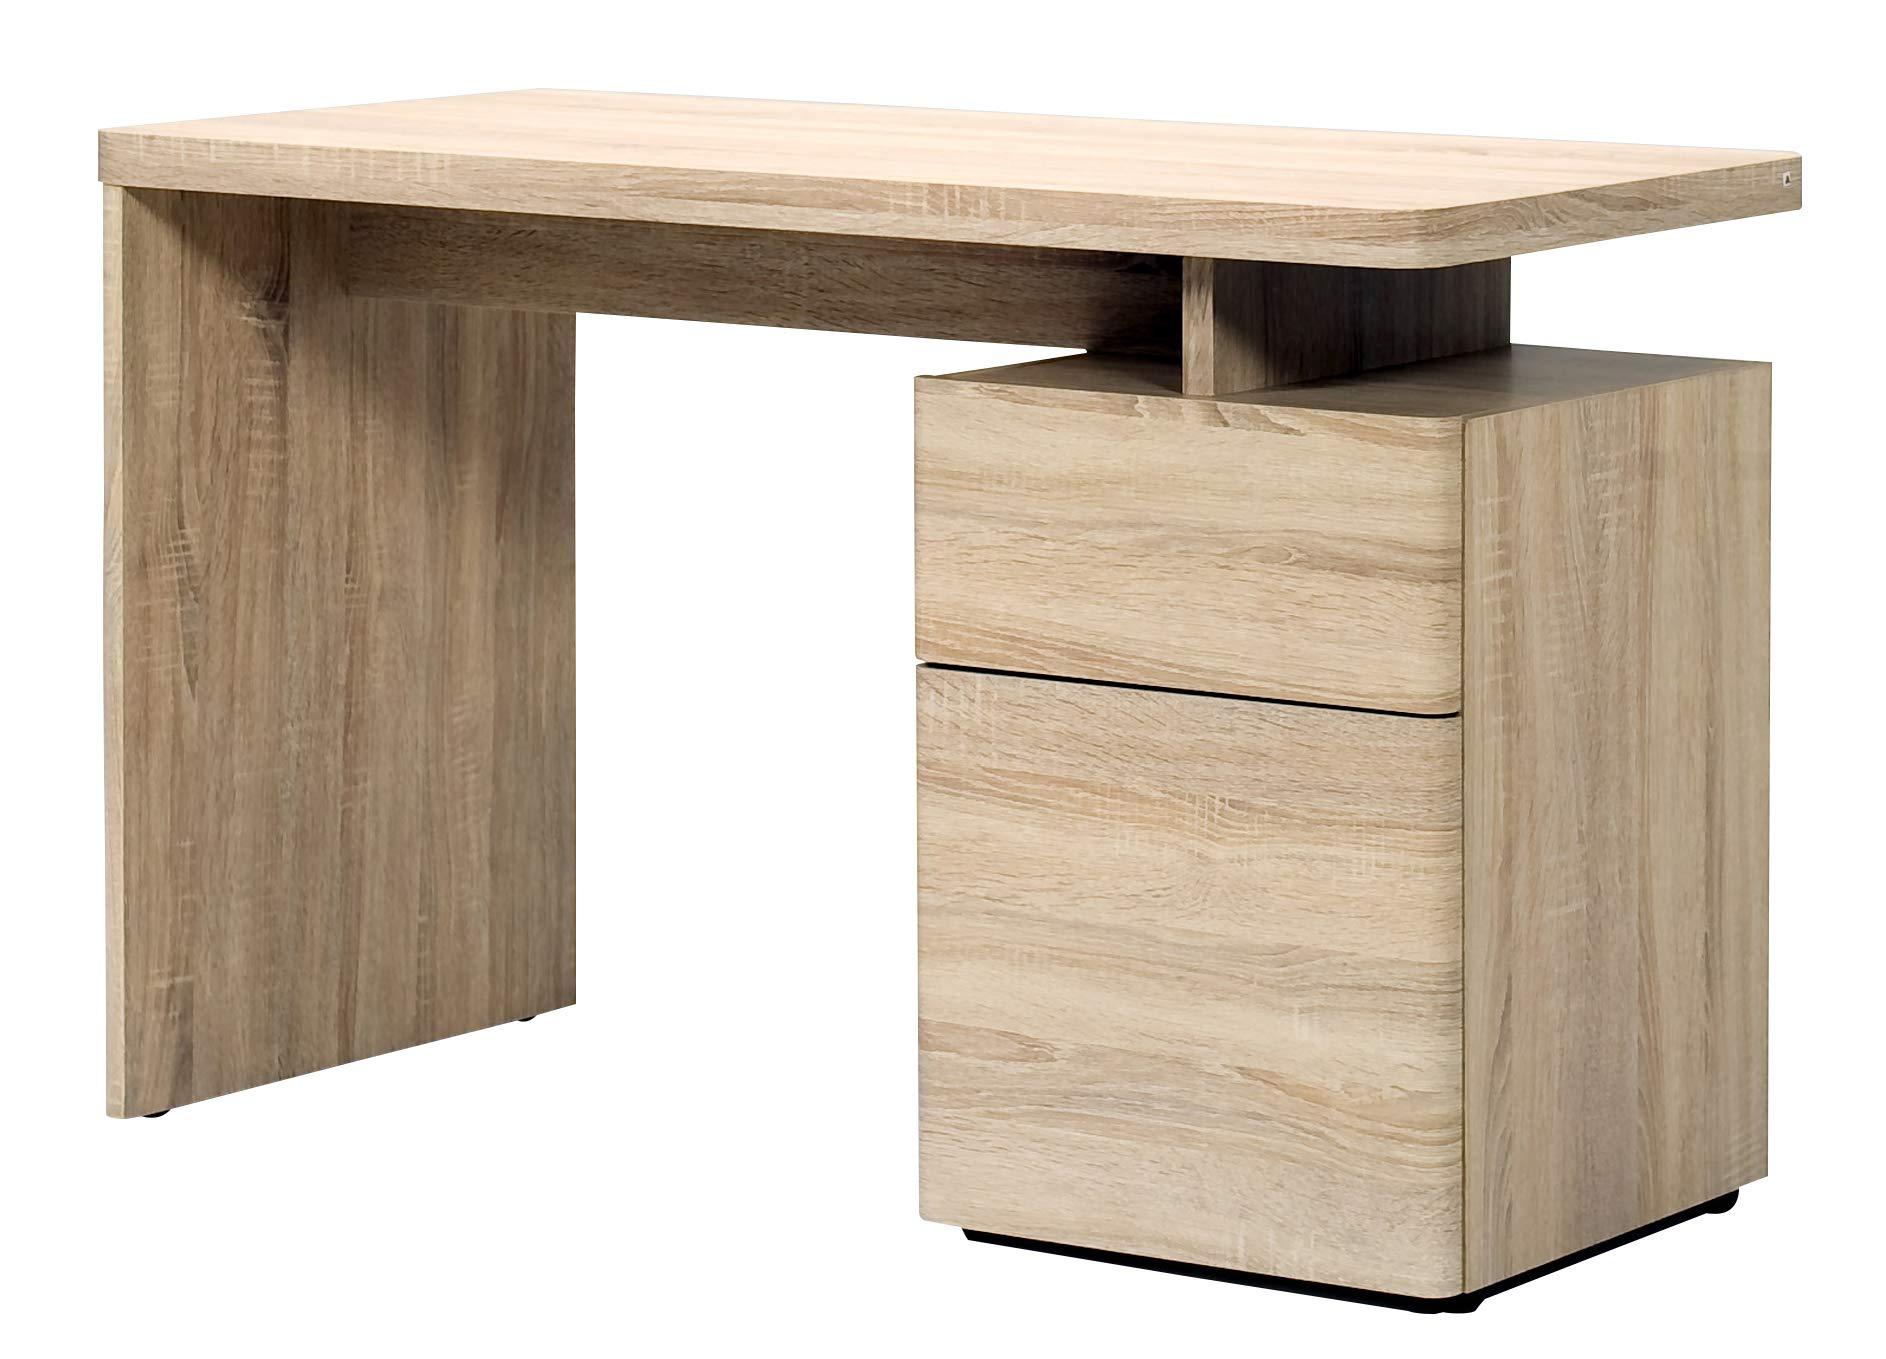 Wood Dark Grey//Light Brown Movian Dining Table